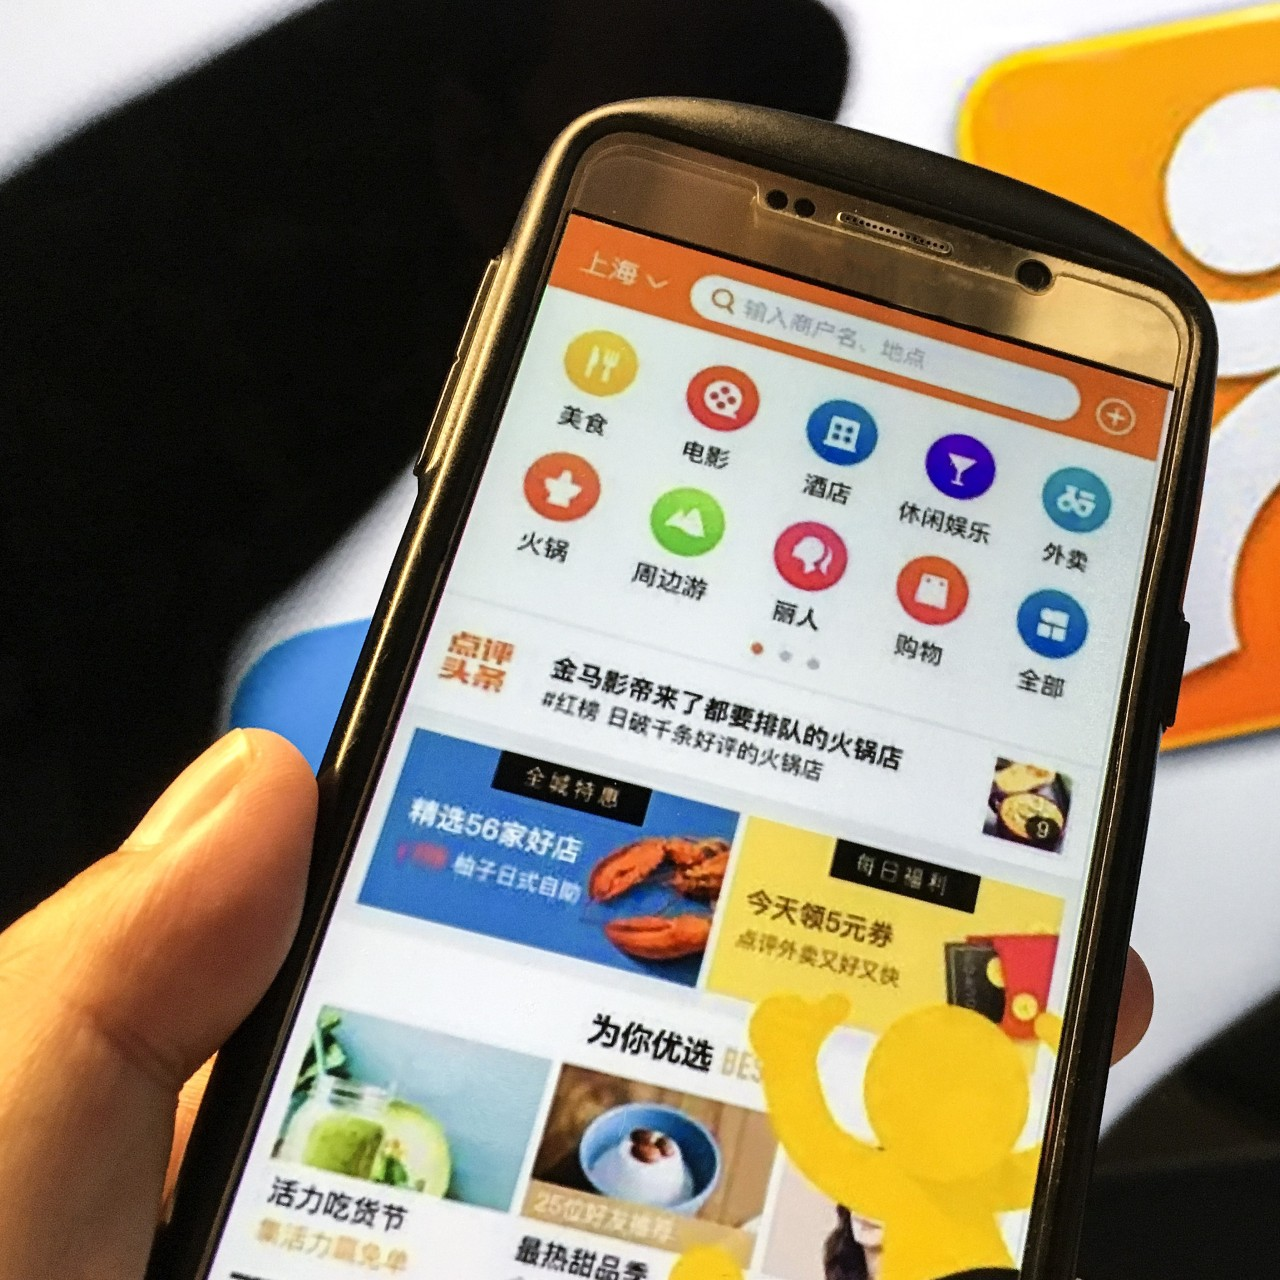 China's Meituan Dianping narrows losses, pushes forward